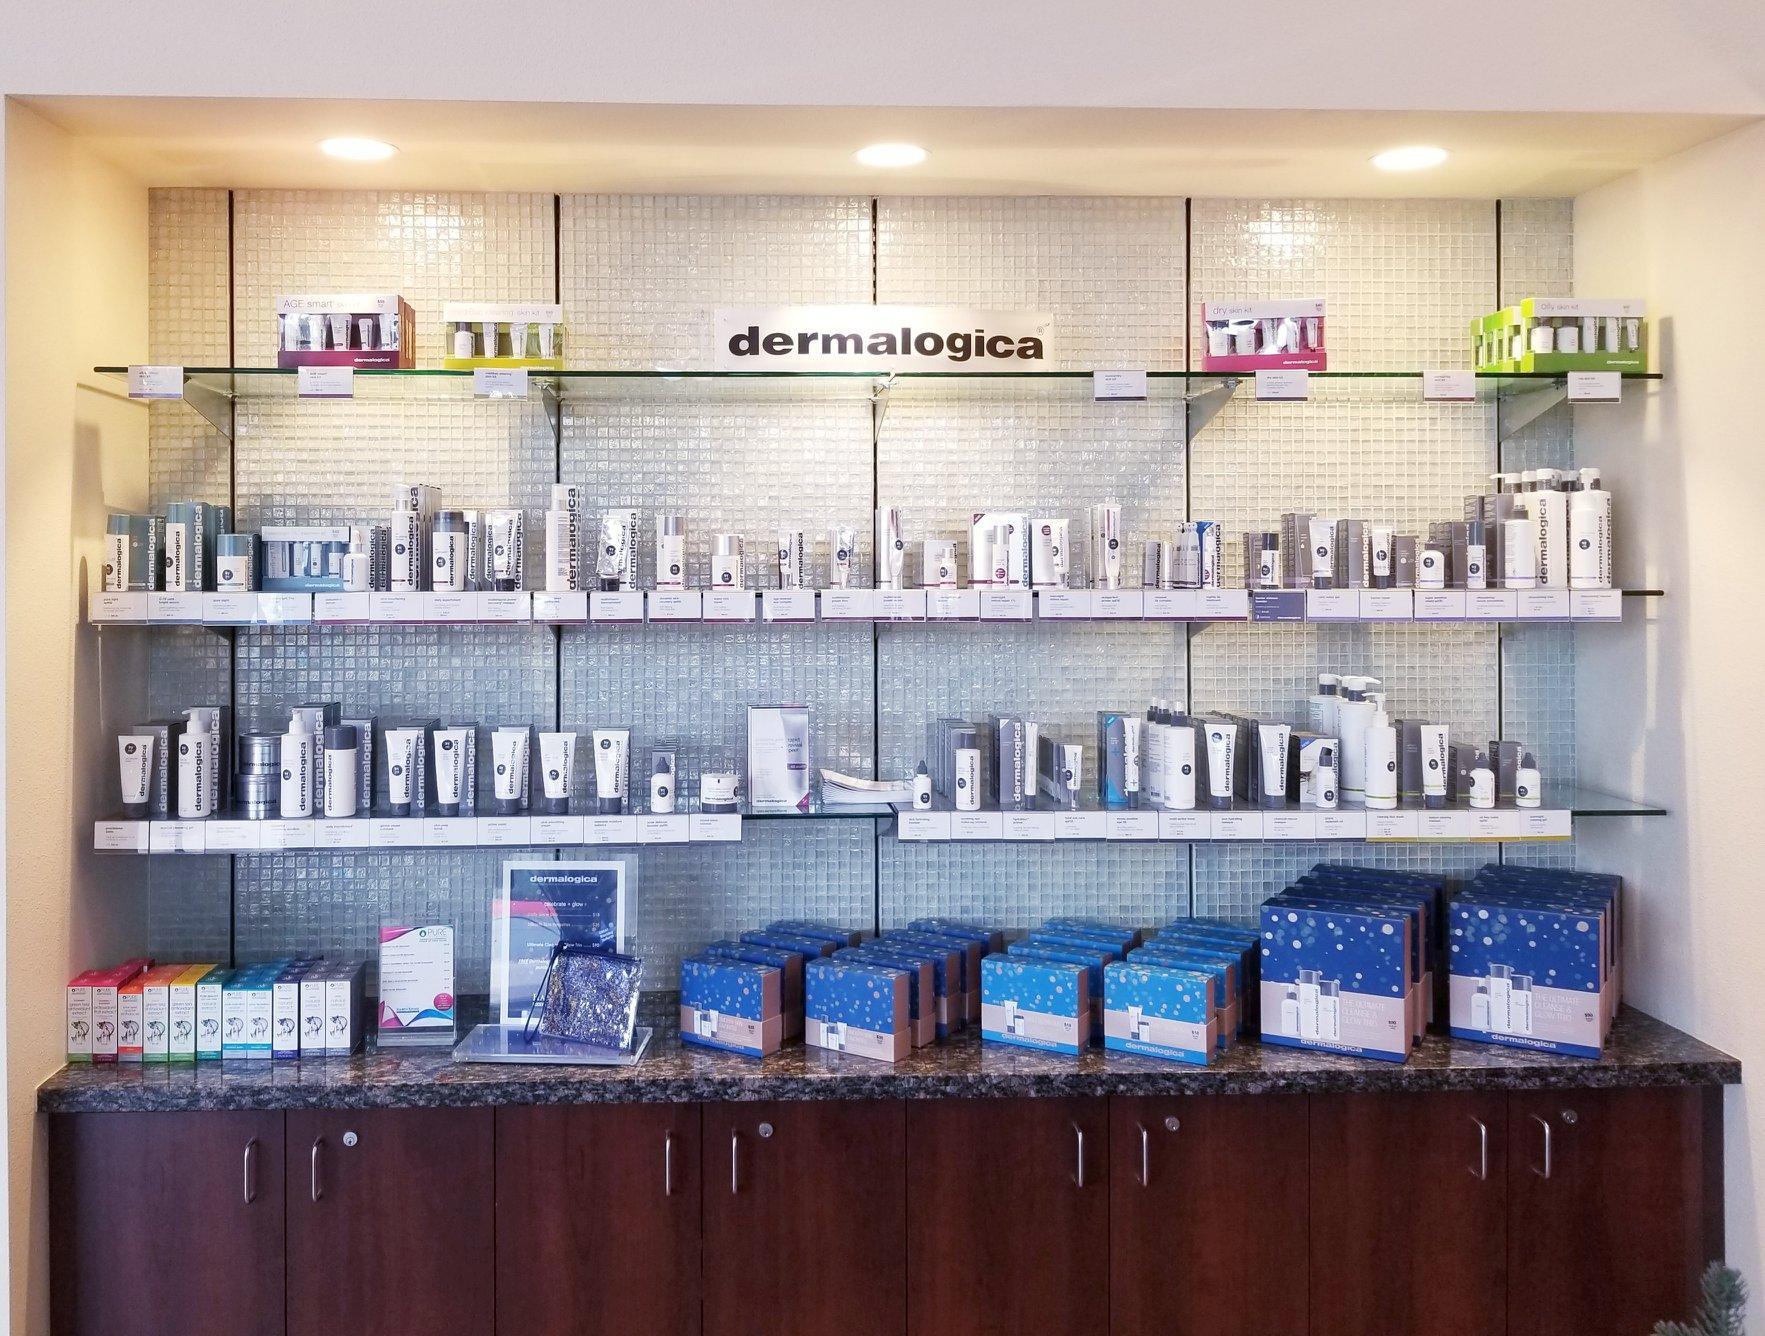 Dermalogica Retail